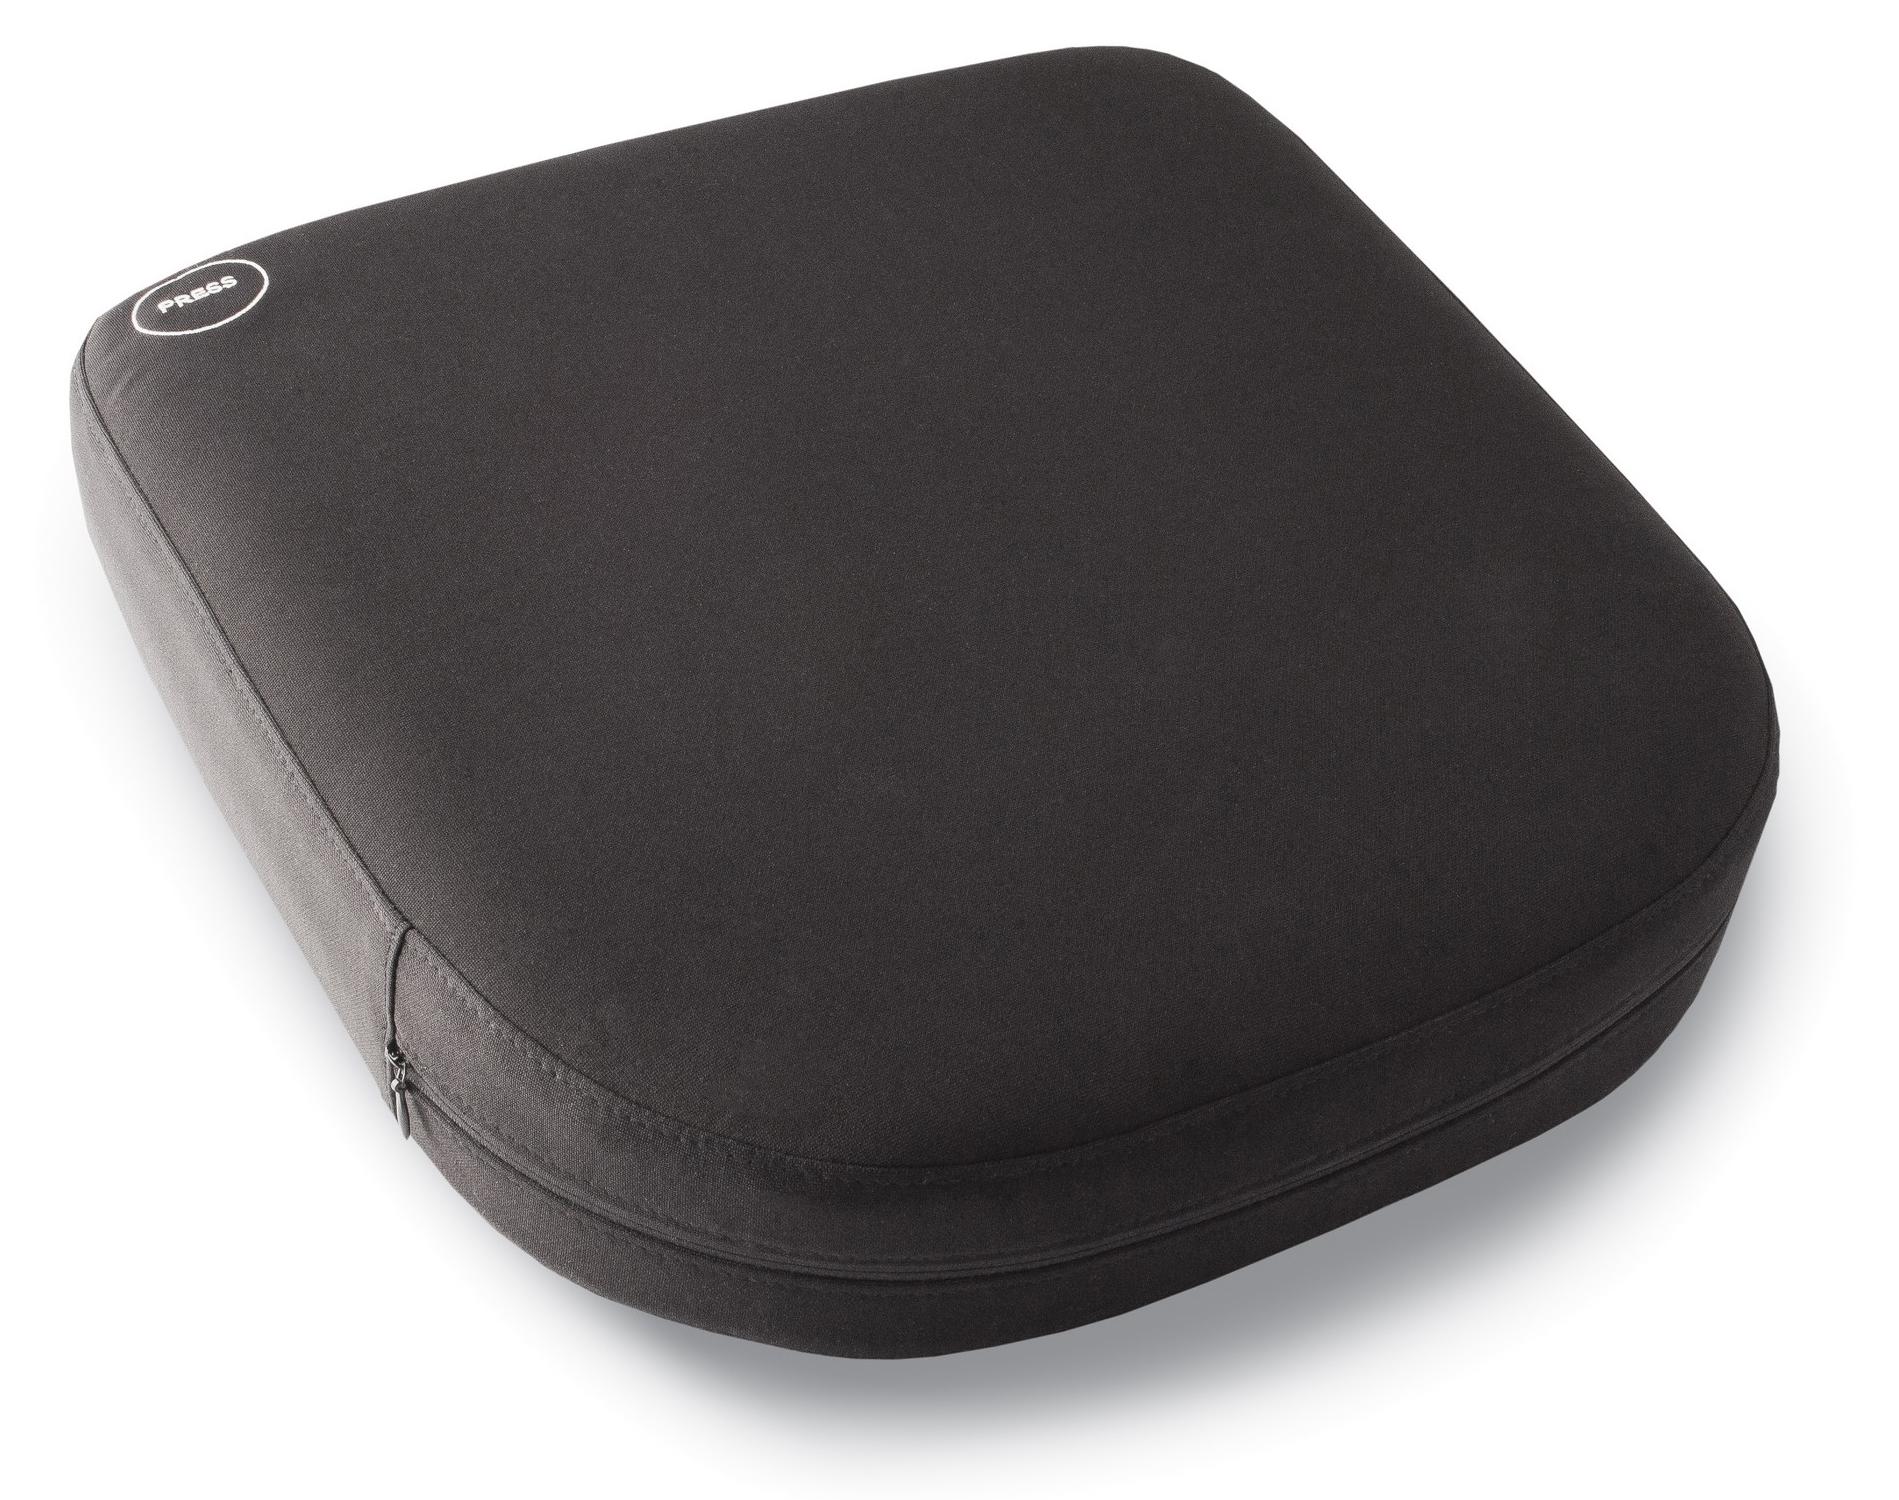 SupporTech Adjustable Memory Foam Seat Cushion by Prestige